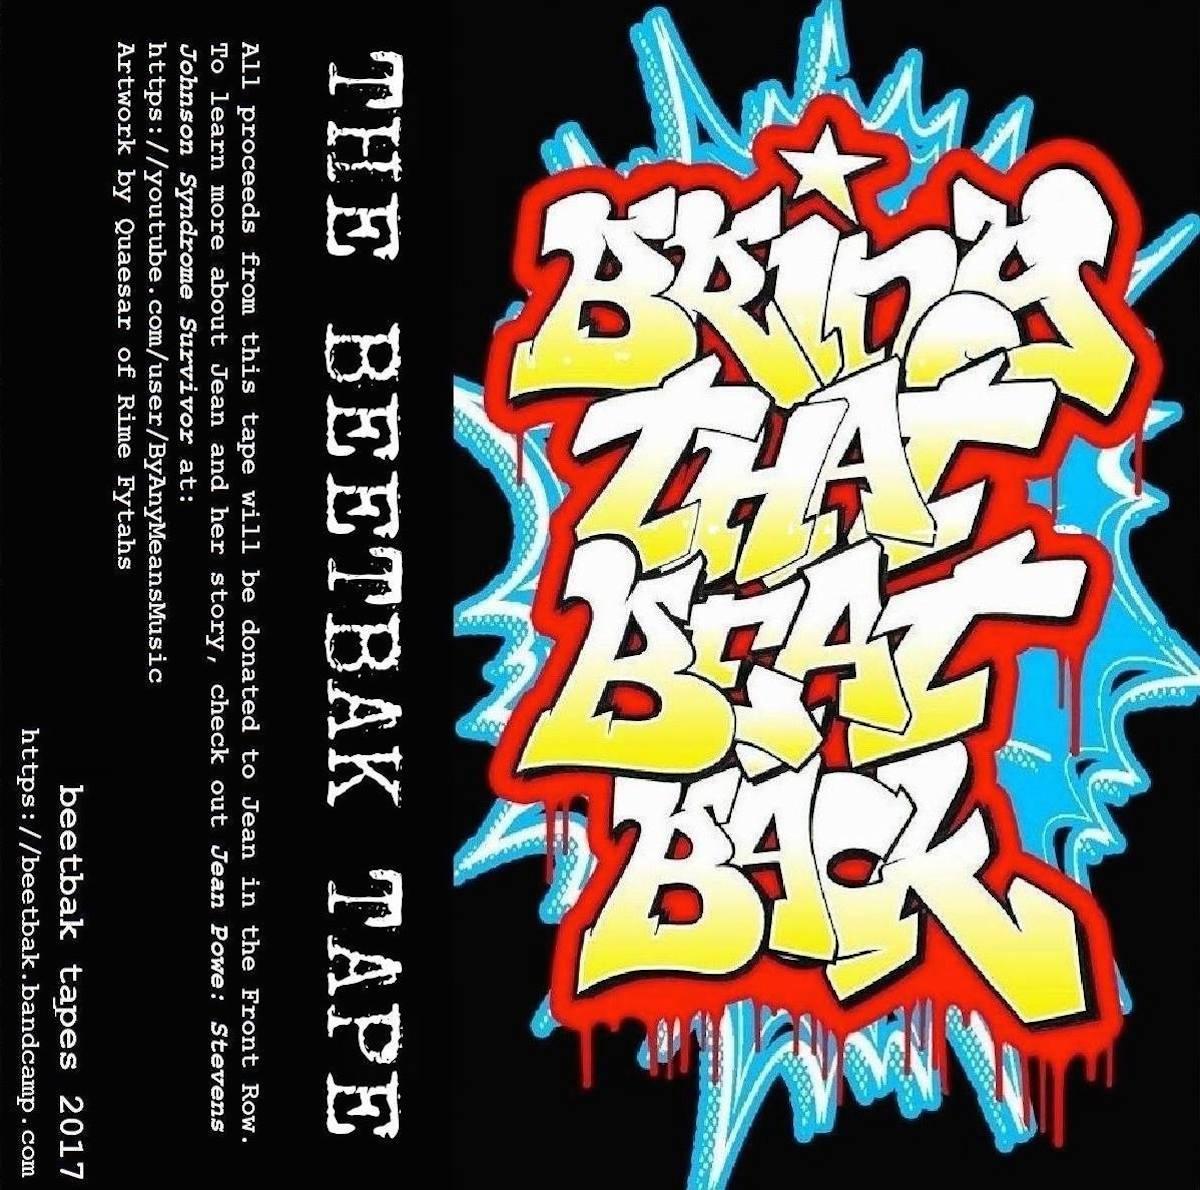 The Beetbak Tape